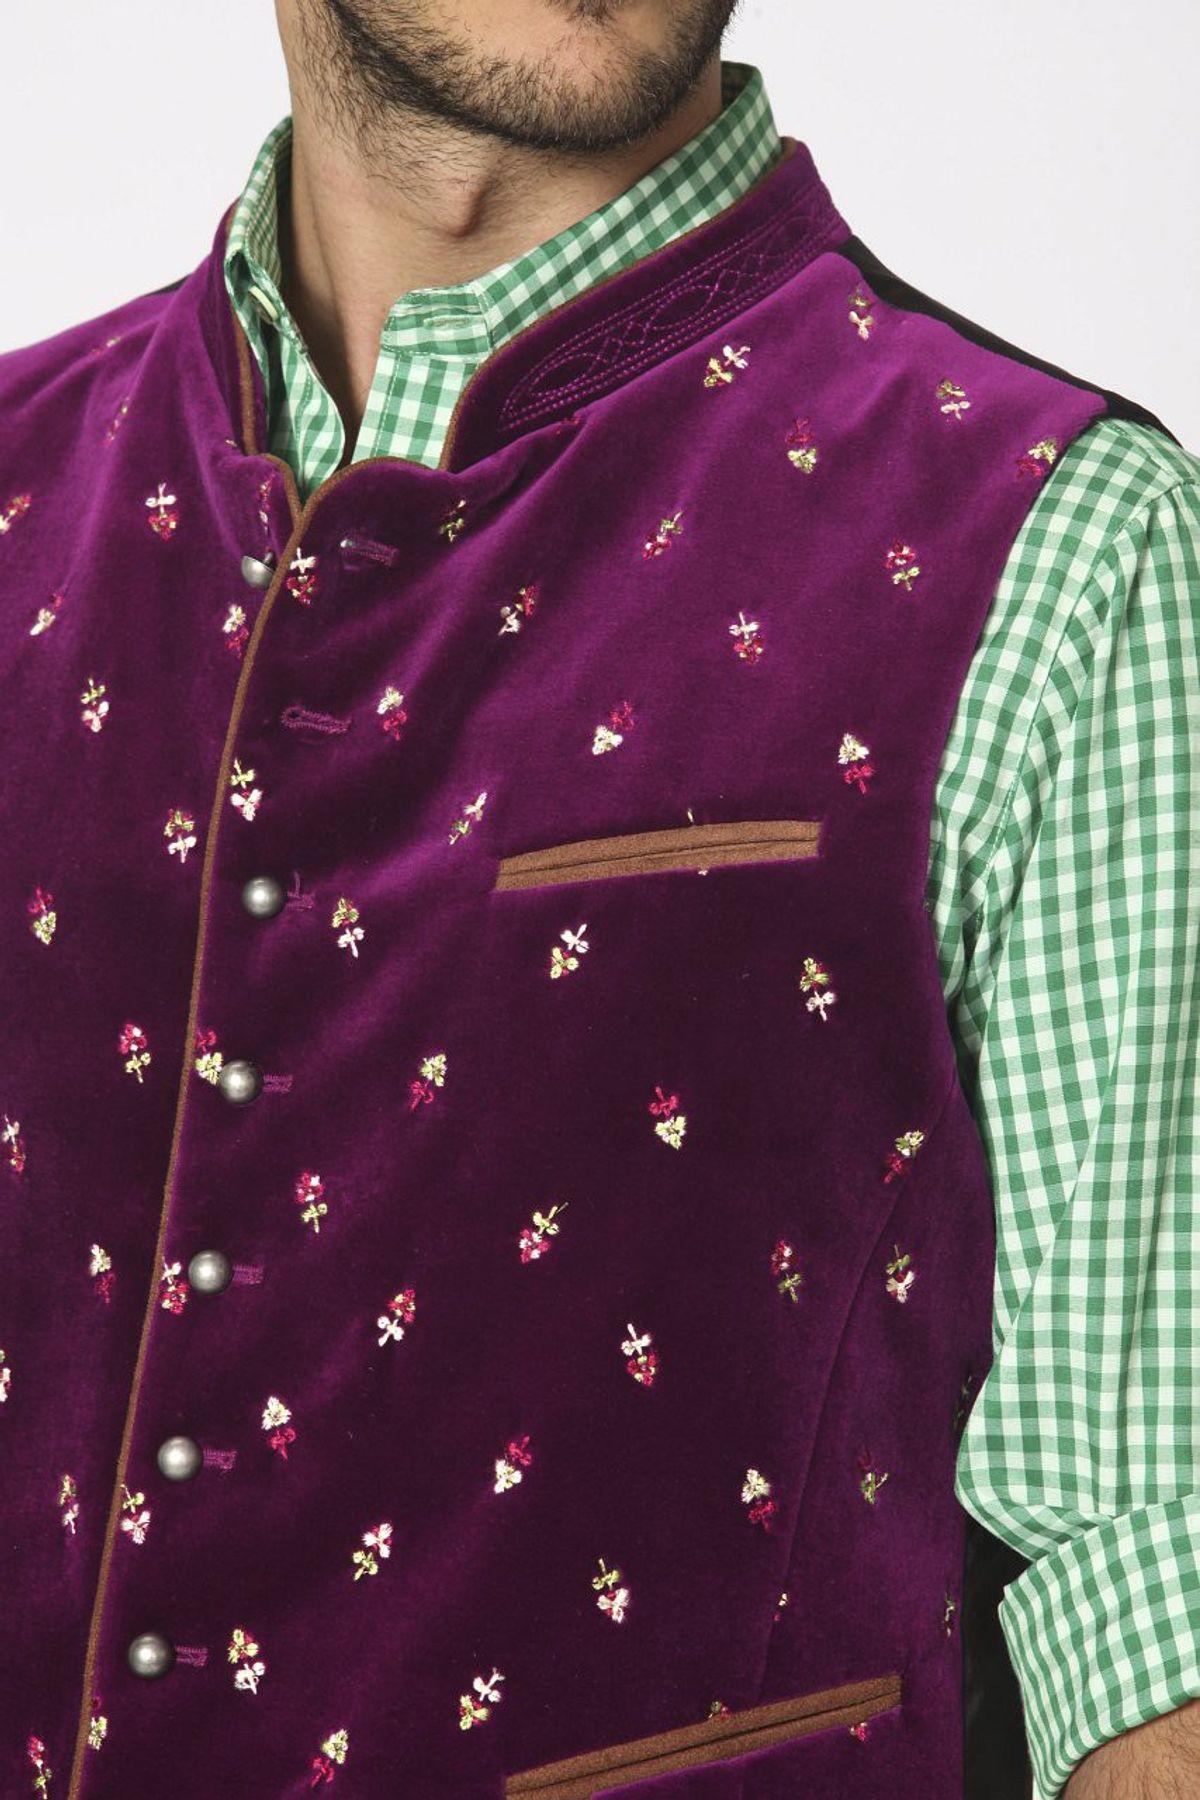 Stockerpoint - Herren Trachten Weste in verschiedenen Farbtönen, Calzado – Bild 24